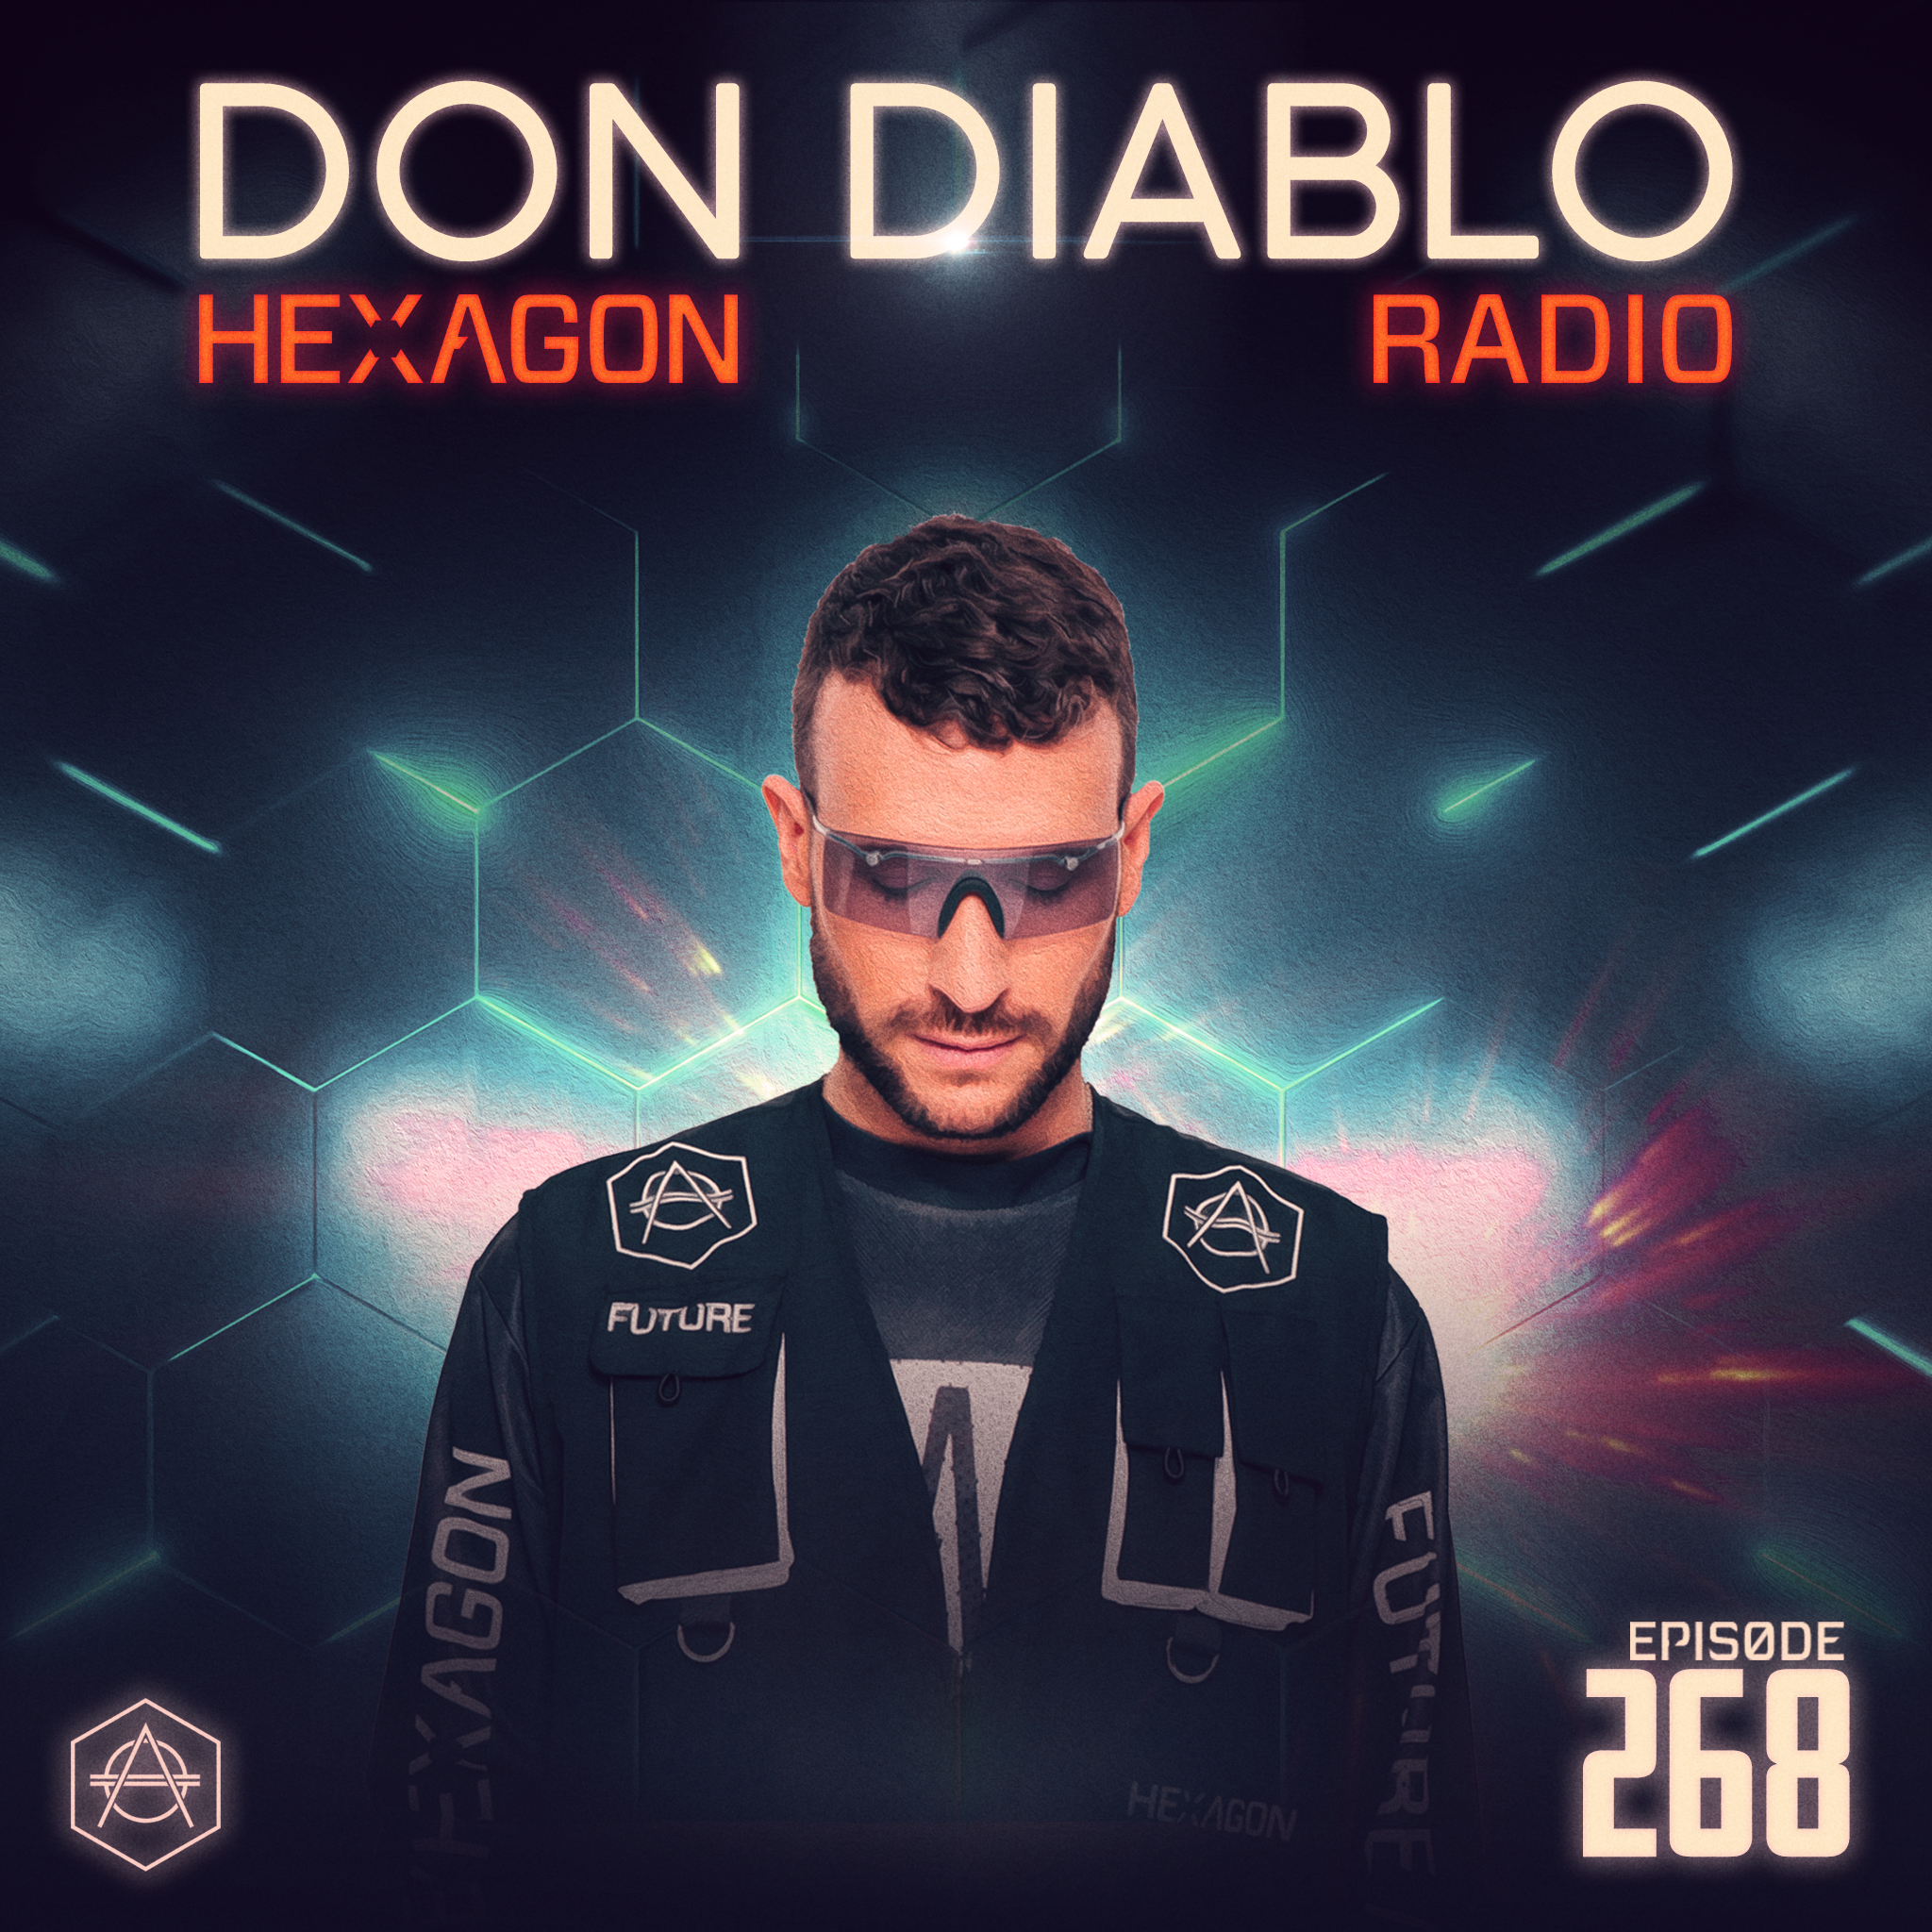 Don Diablo Hexagon Radio Episode 268